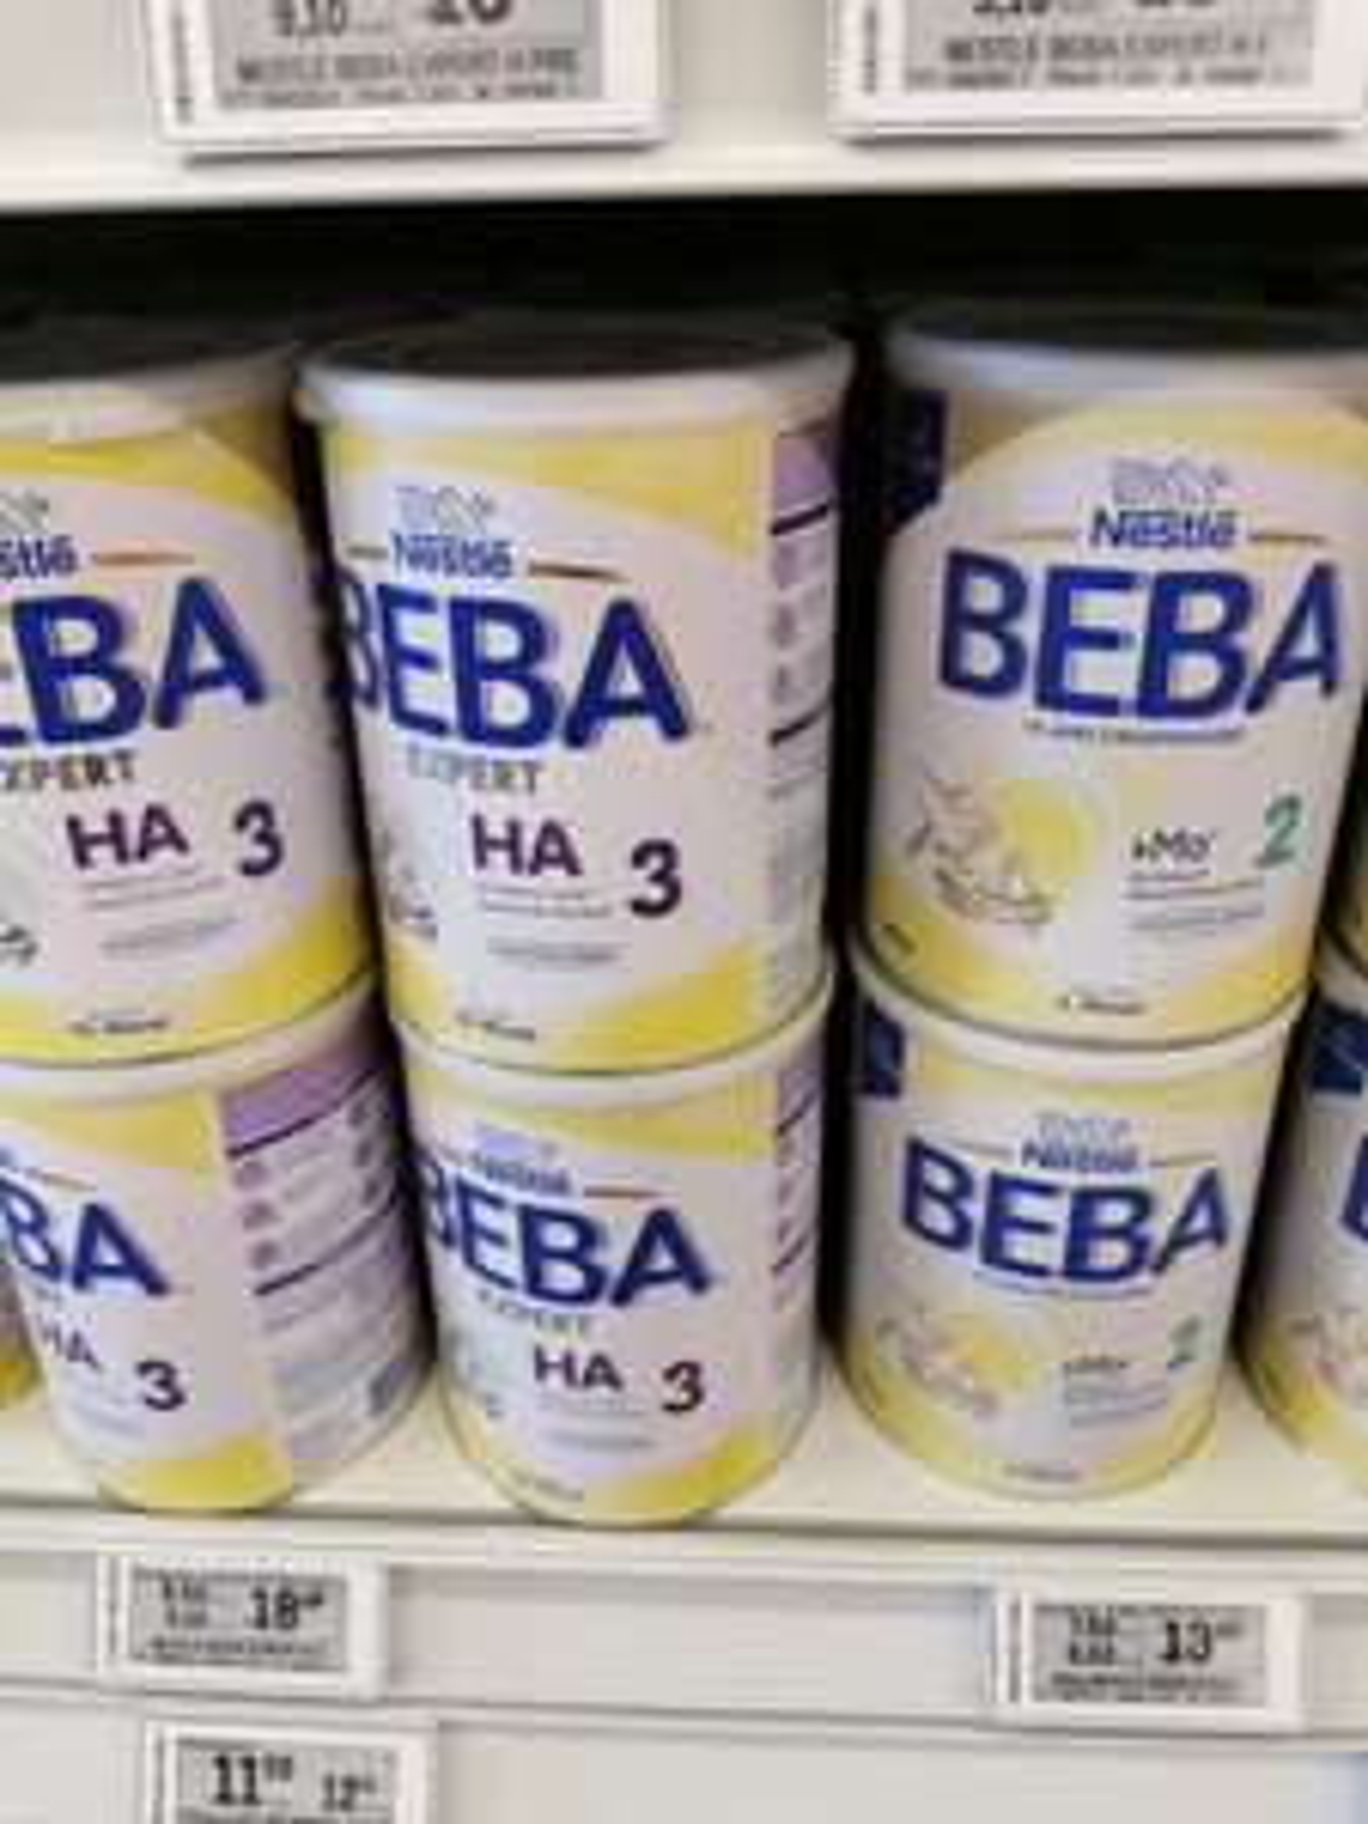 Nestle Beba Expert Ha 3 800g Metro Porta Westfalica (Lokal)